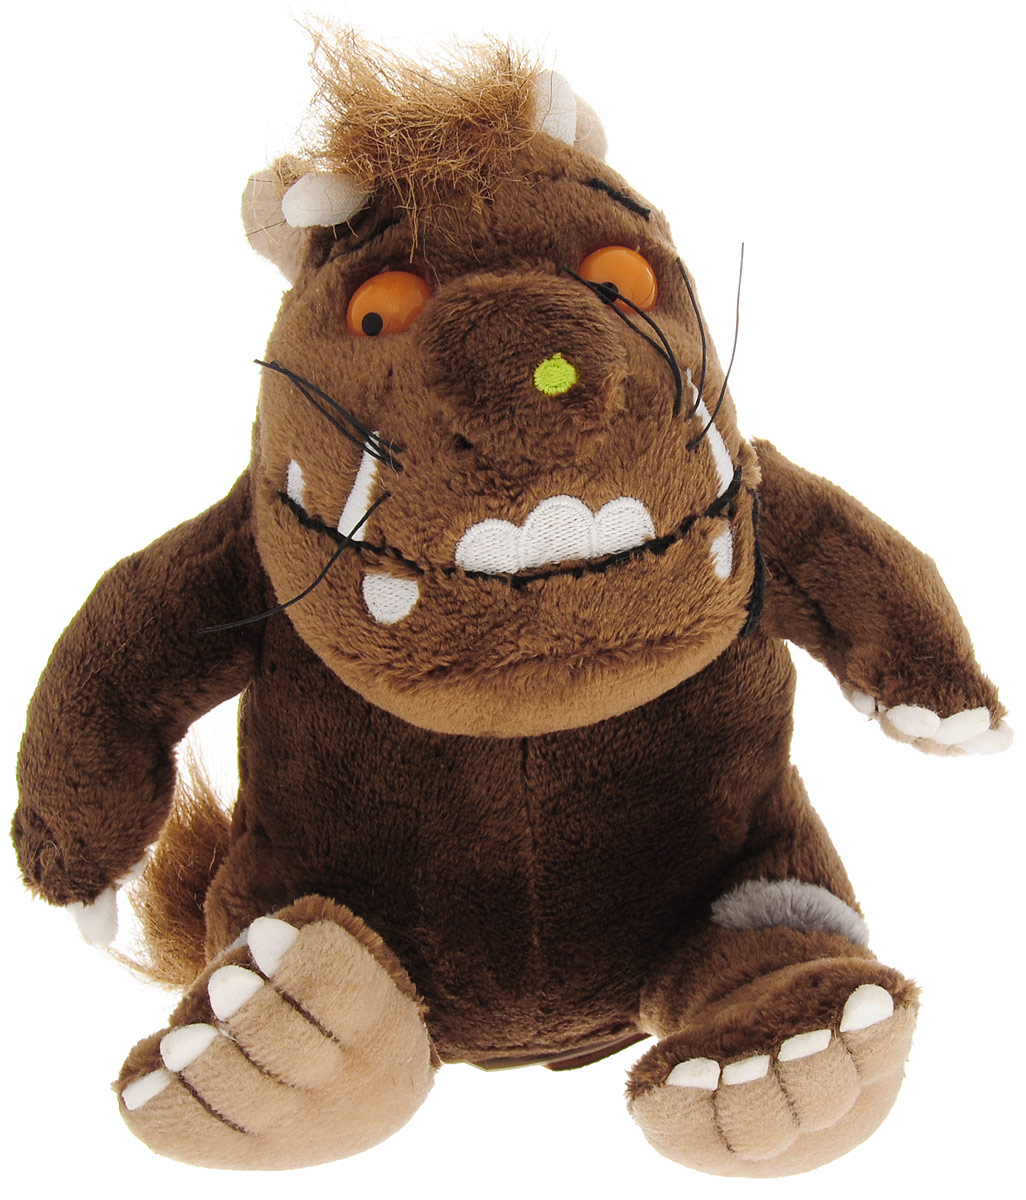 Gruffalo Мягкая игрушка Груффало 18 см игрушка